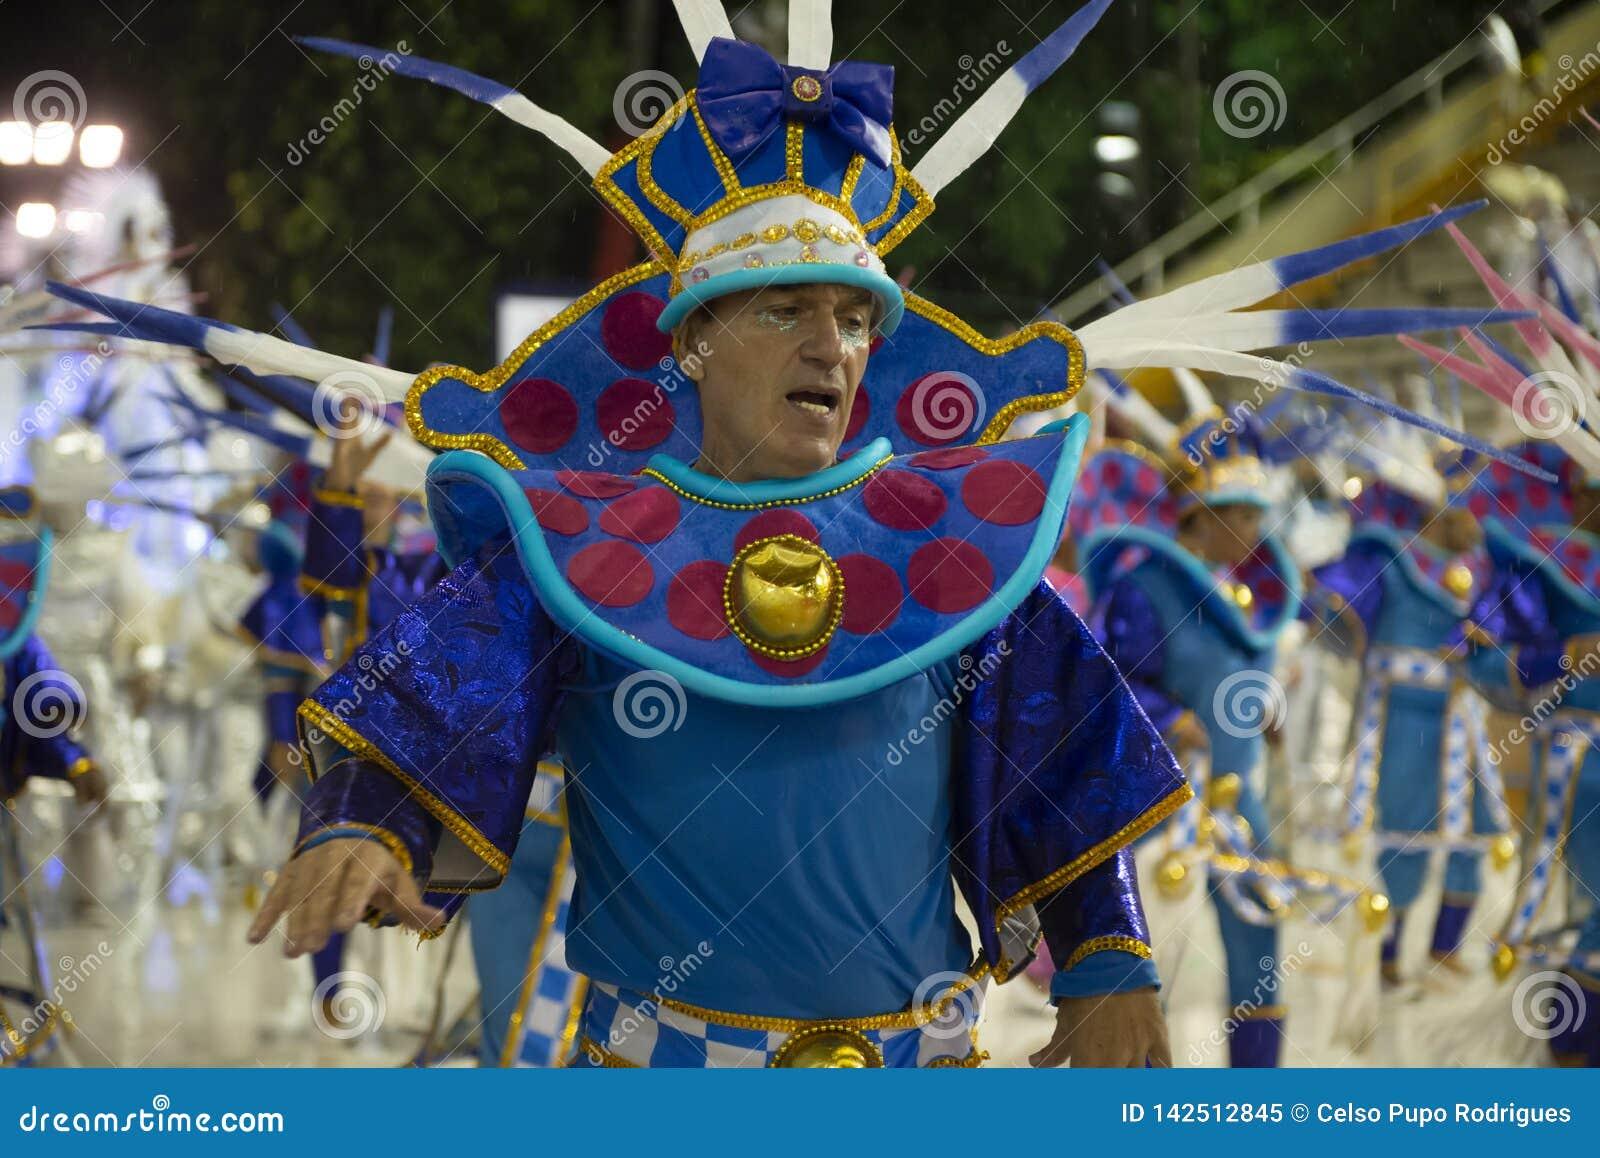 Carnaval 2019 - Unidos a Dinamarca Ponte